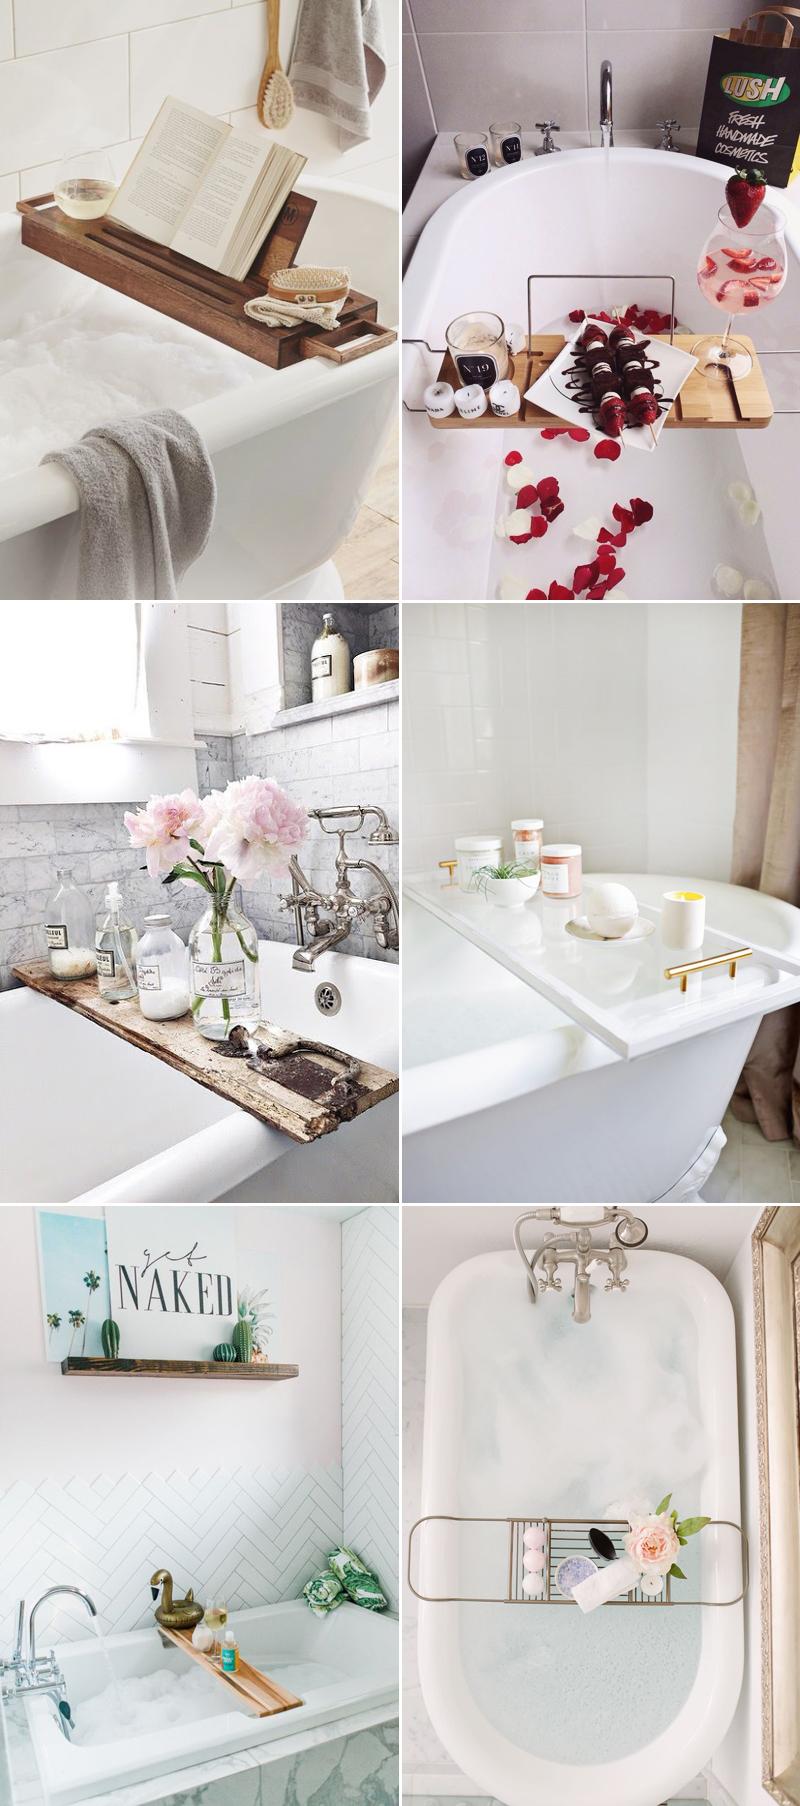 luxurybathroom01-bathtub-caddy